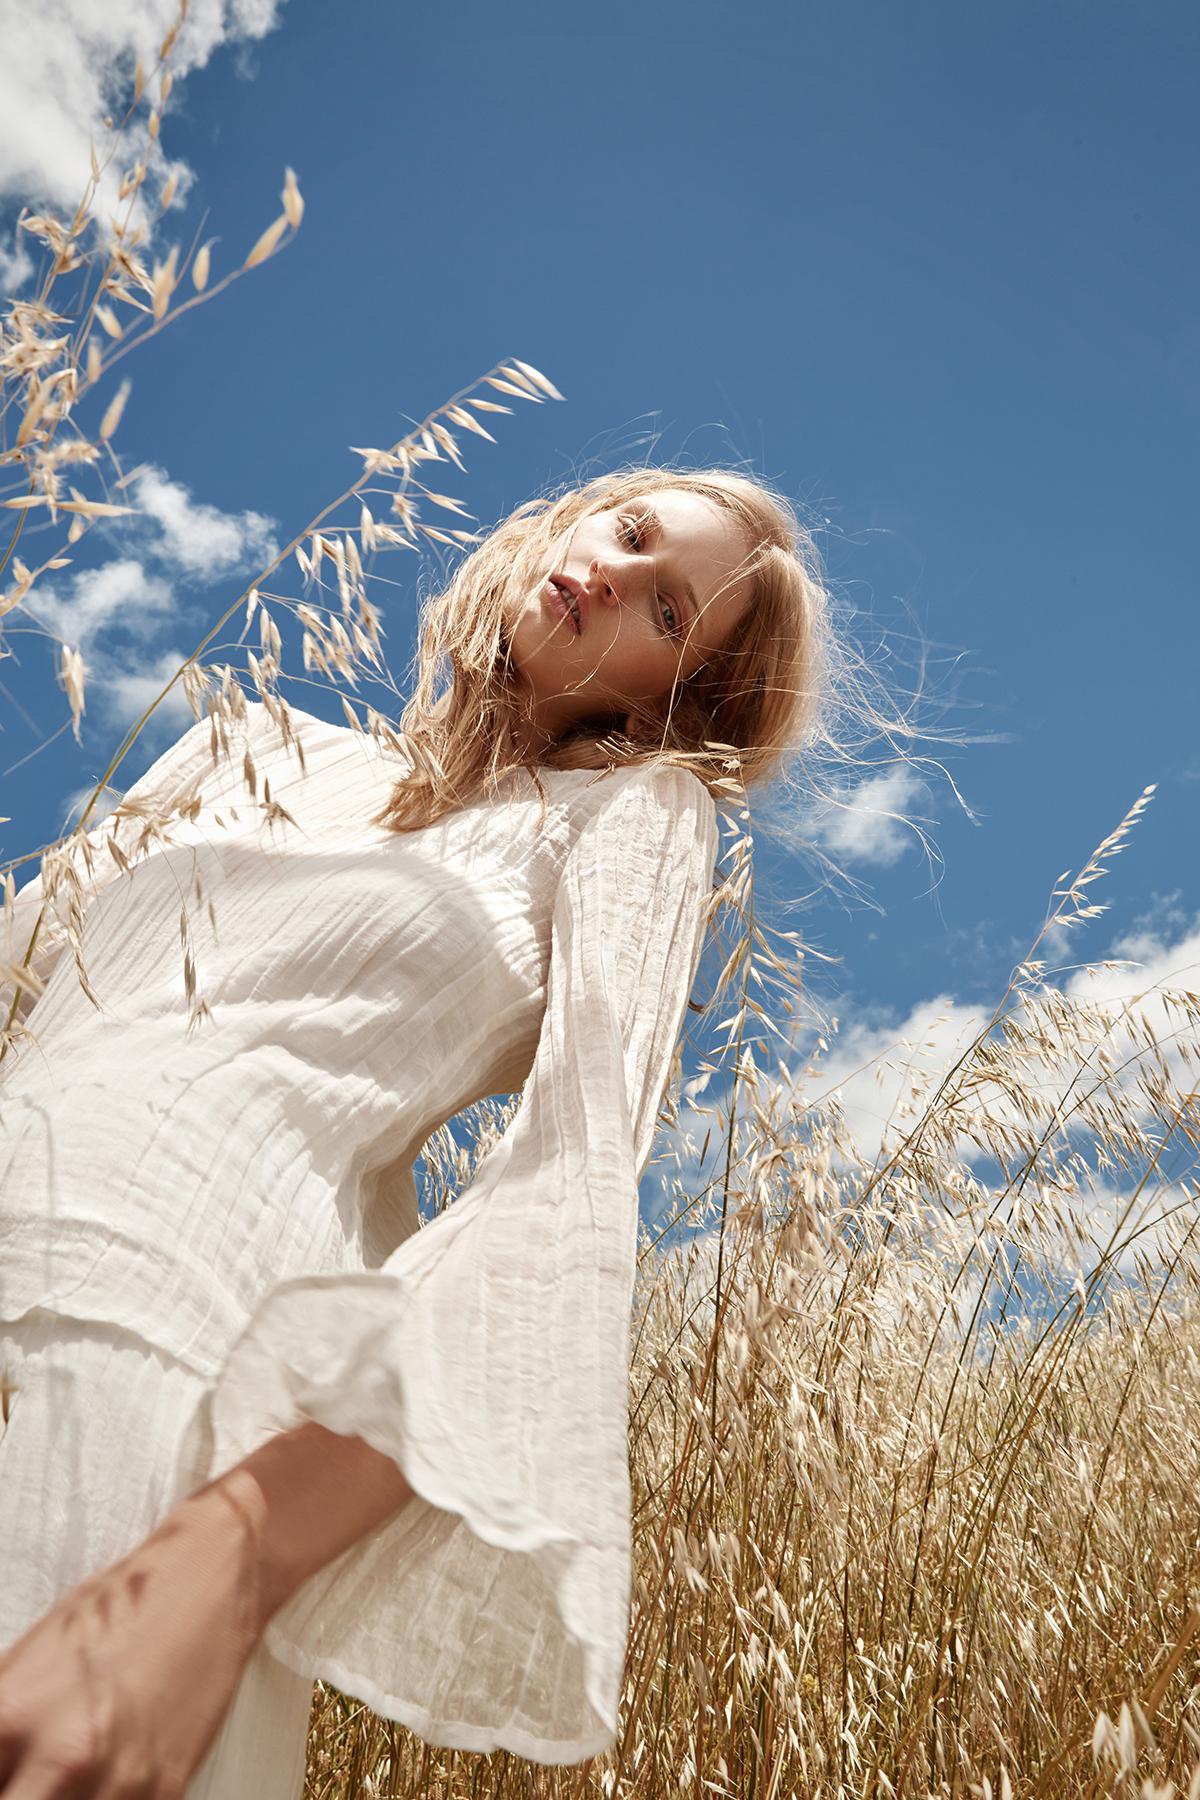 Shop  Evoke Long Sleeve Top  +  Evoke Skirt .